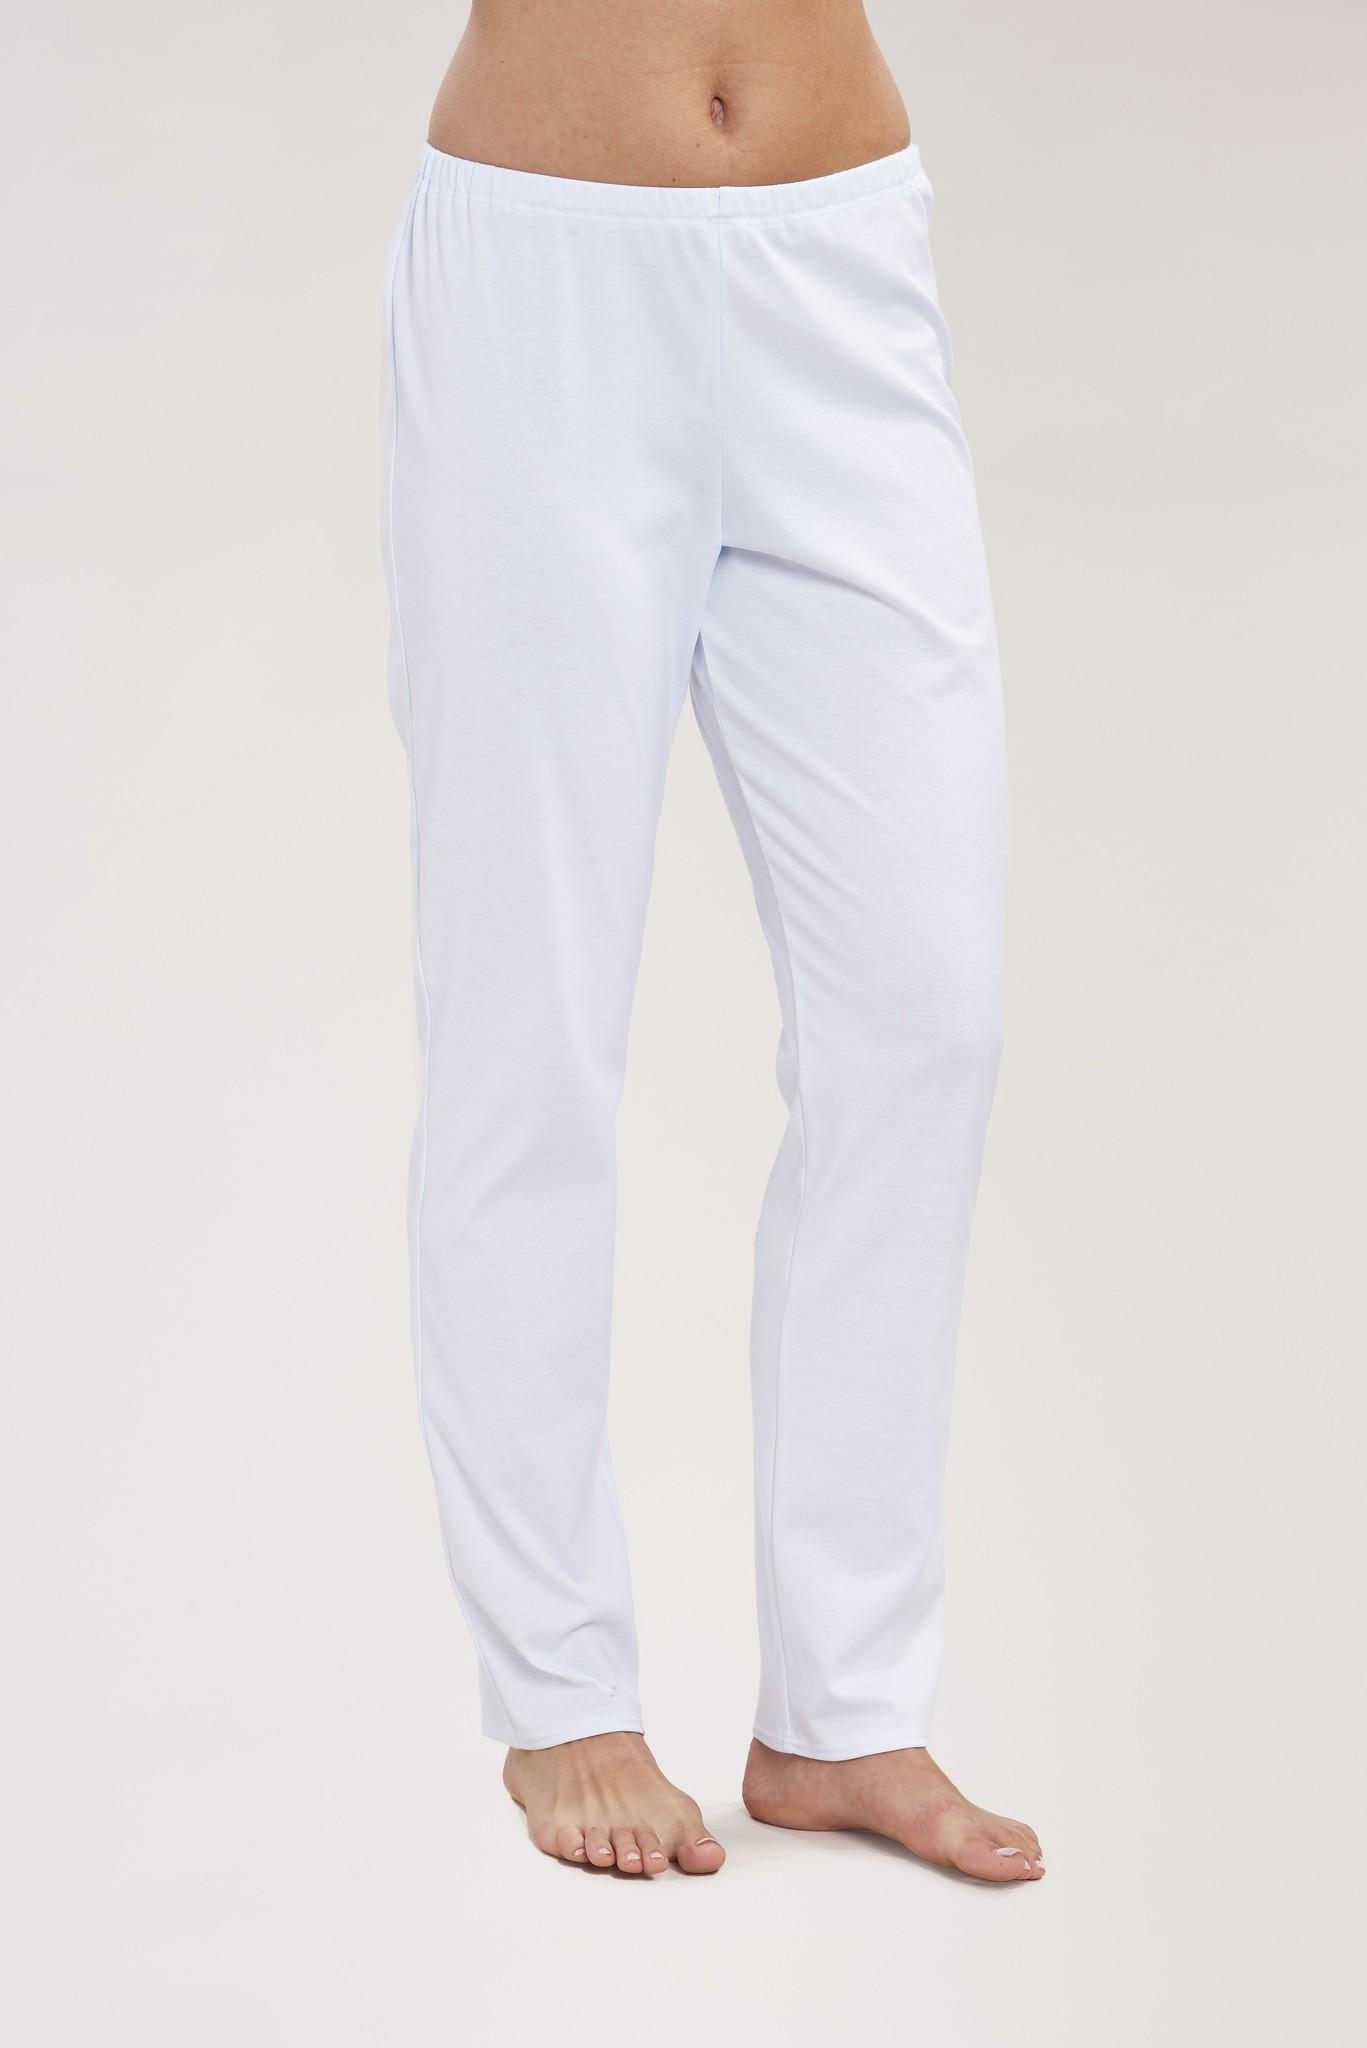 Féraud - Rösch   FÉRAUD Paris High Class Damen Pyjama Langarm mit Tunika Ausschnitt